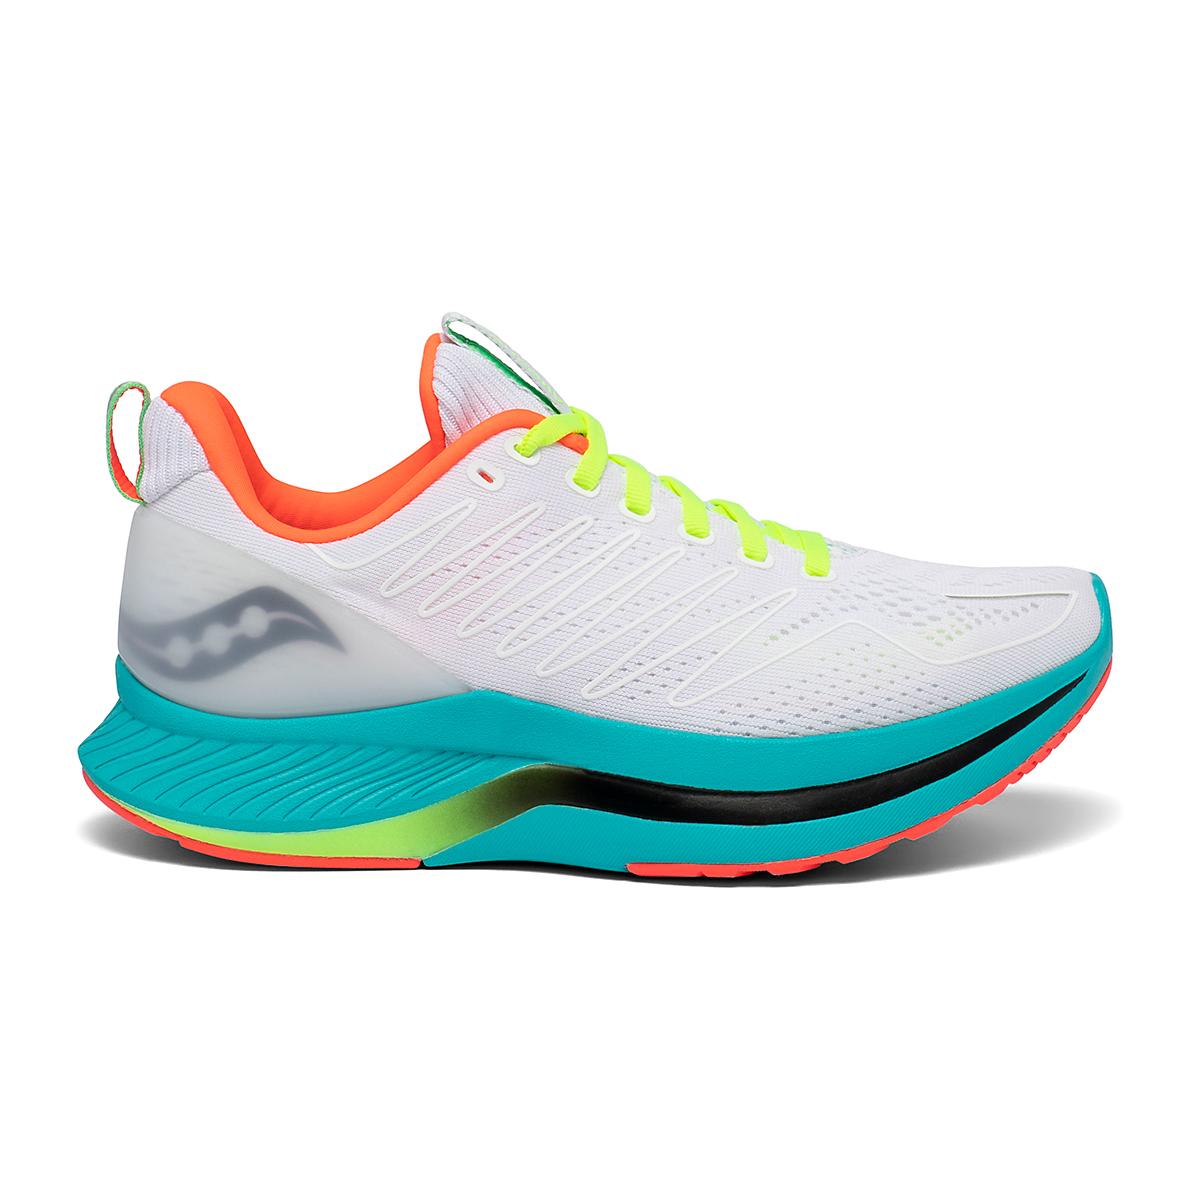 Women's Saucony Endorphin Shift Running Shoe - Color: White Mutant - Size: 5 - Width: Regular, White Mutant, large, image 1